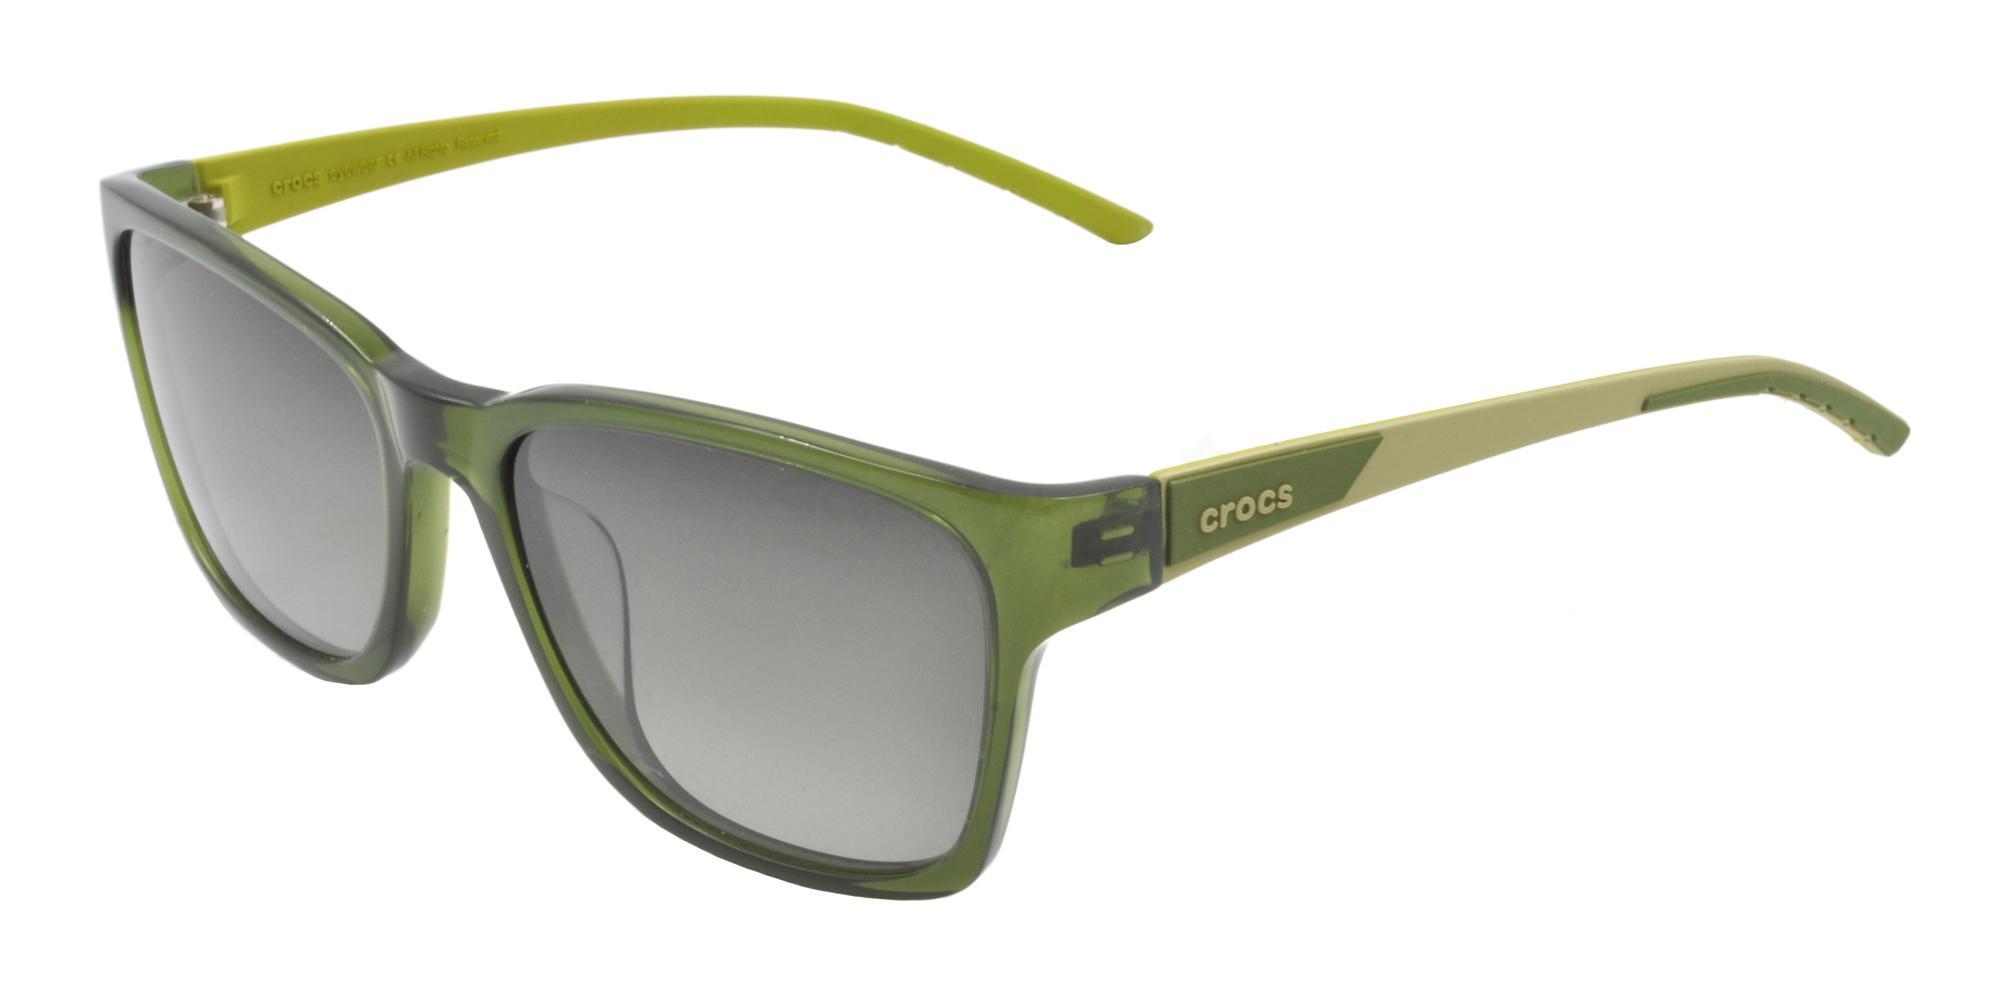 30KI CS051 Sunglasses, Crocs Eyewear